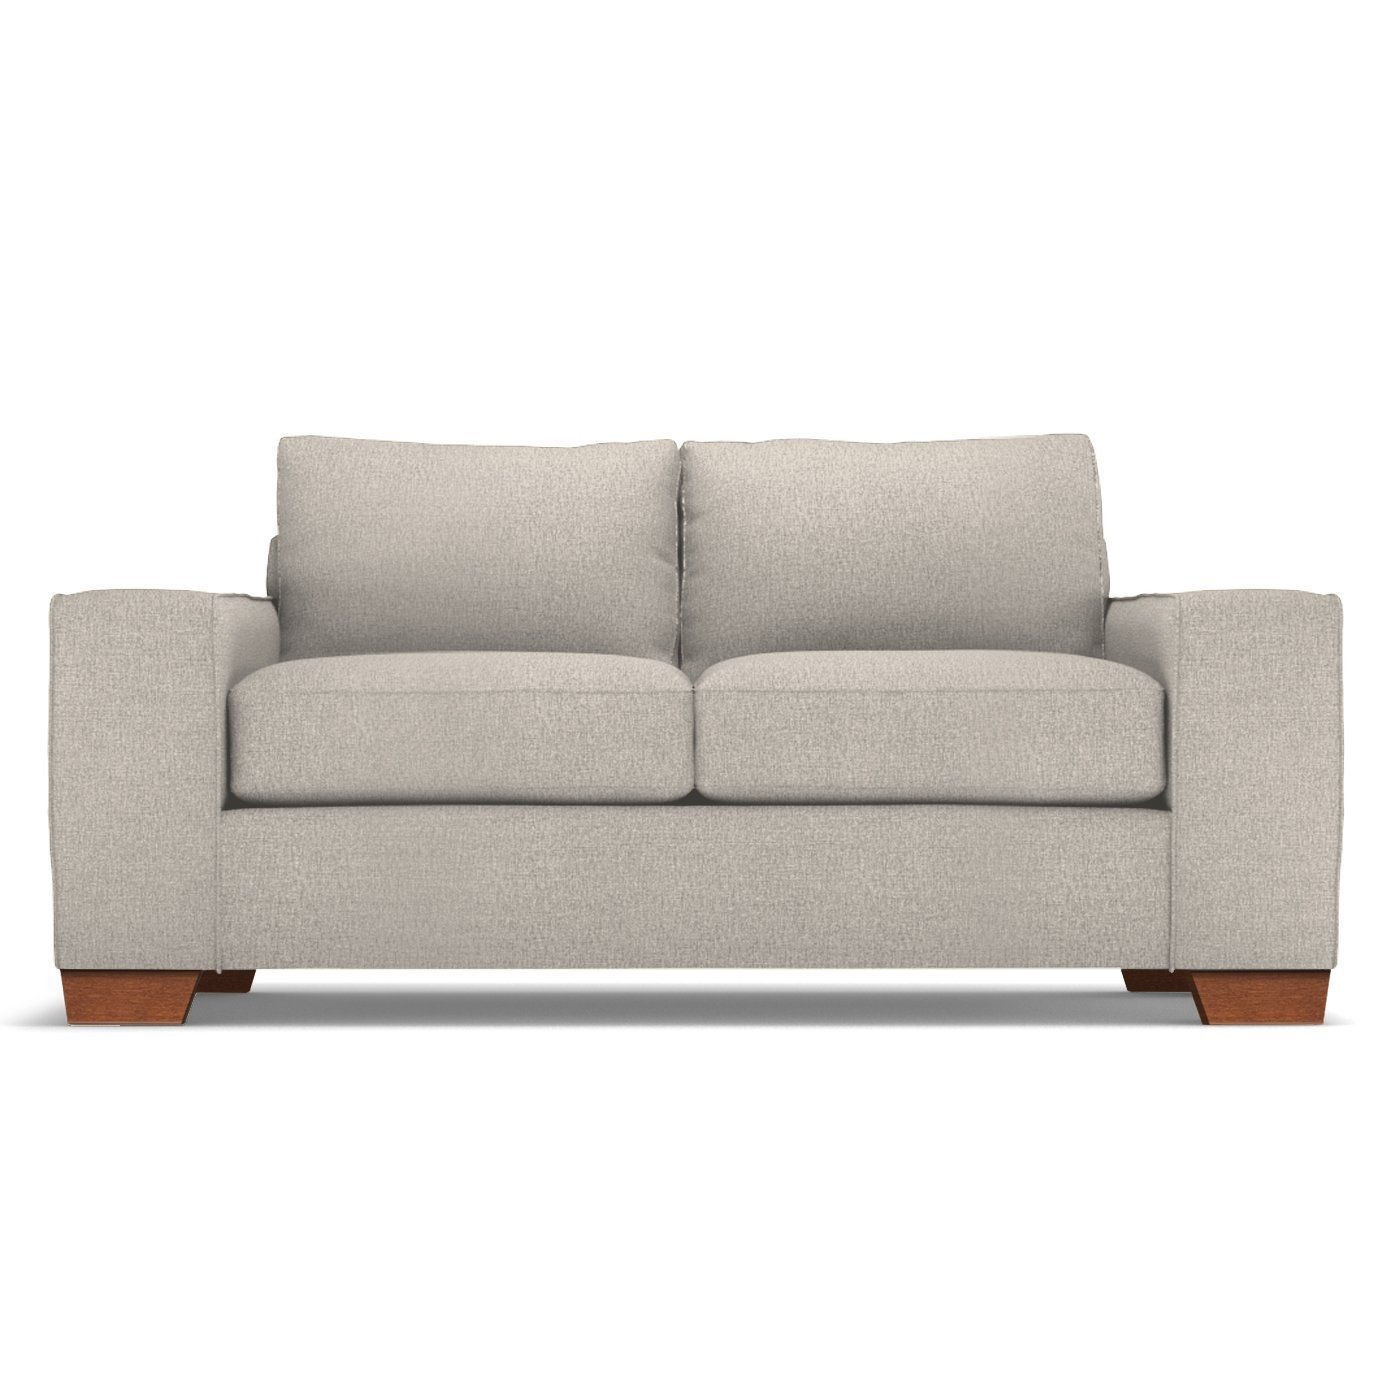 Melrose Apartment Size Sofa Leg Finish Pecan Size Apartment